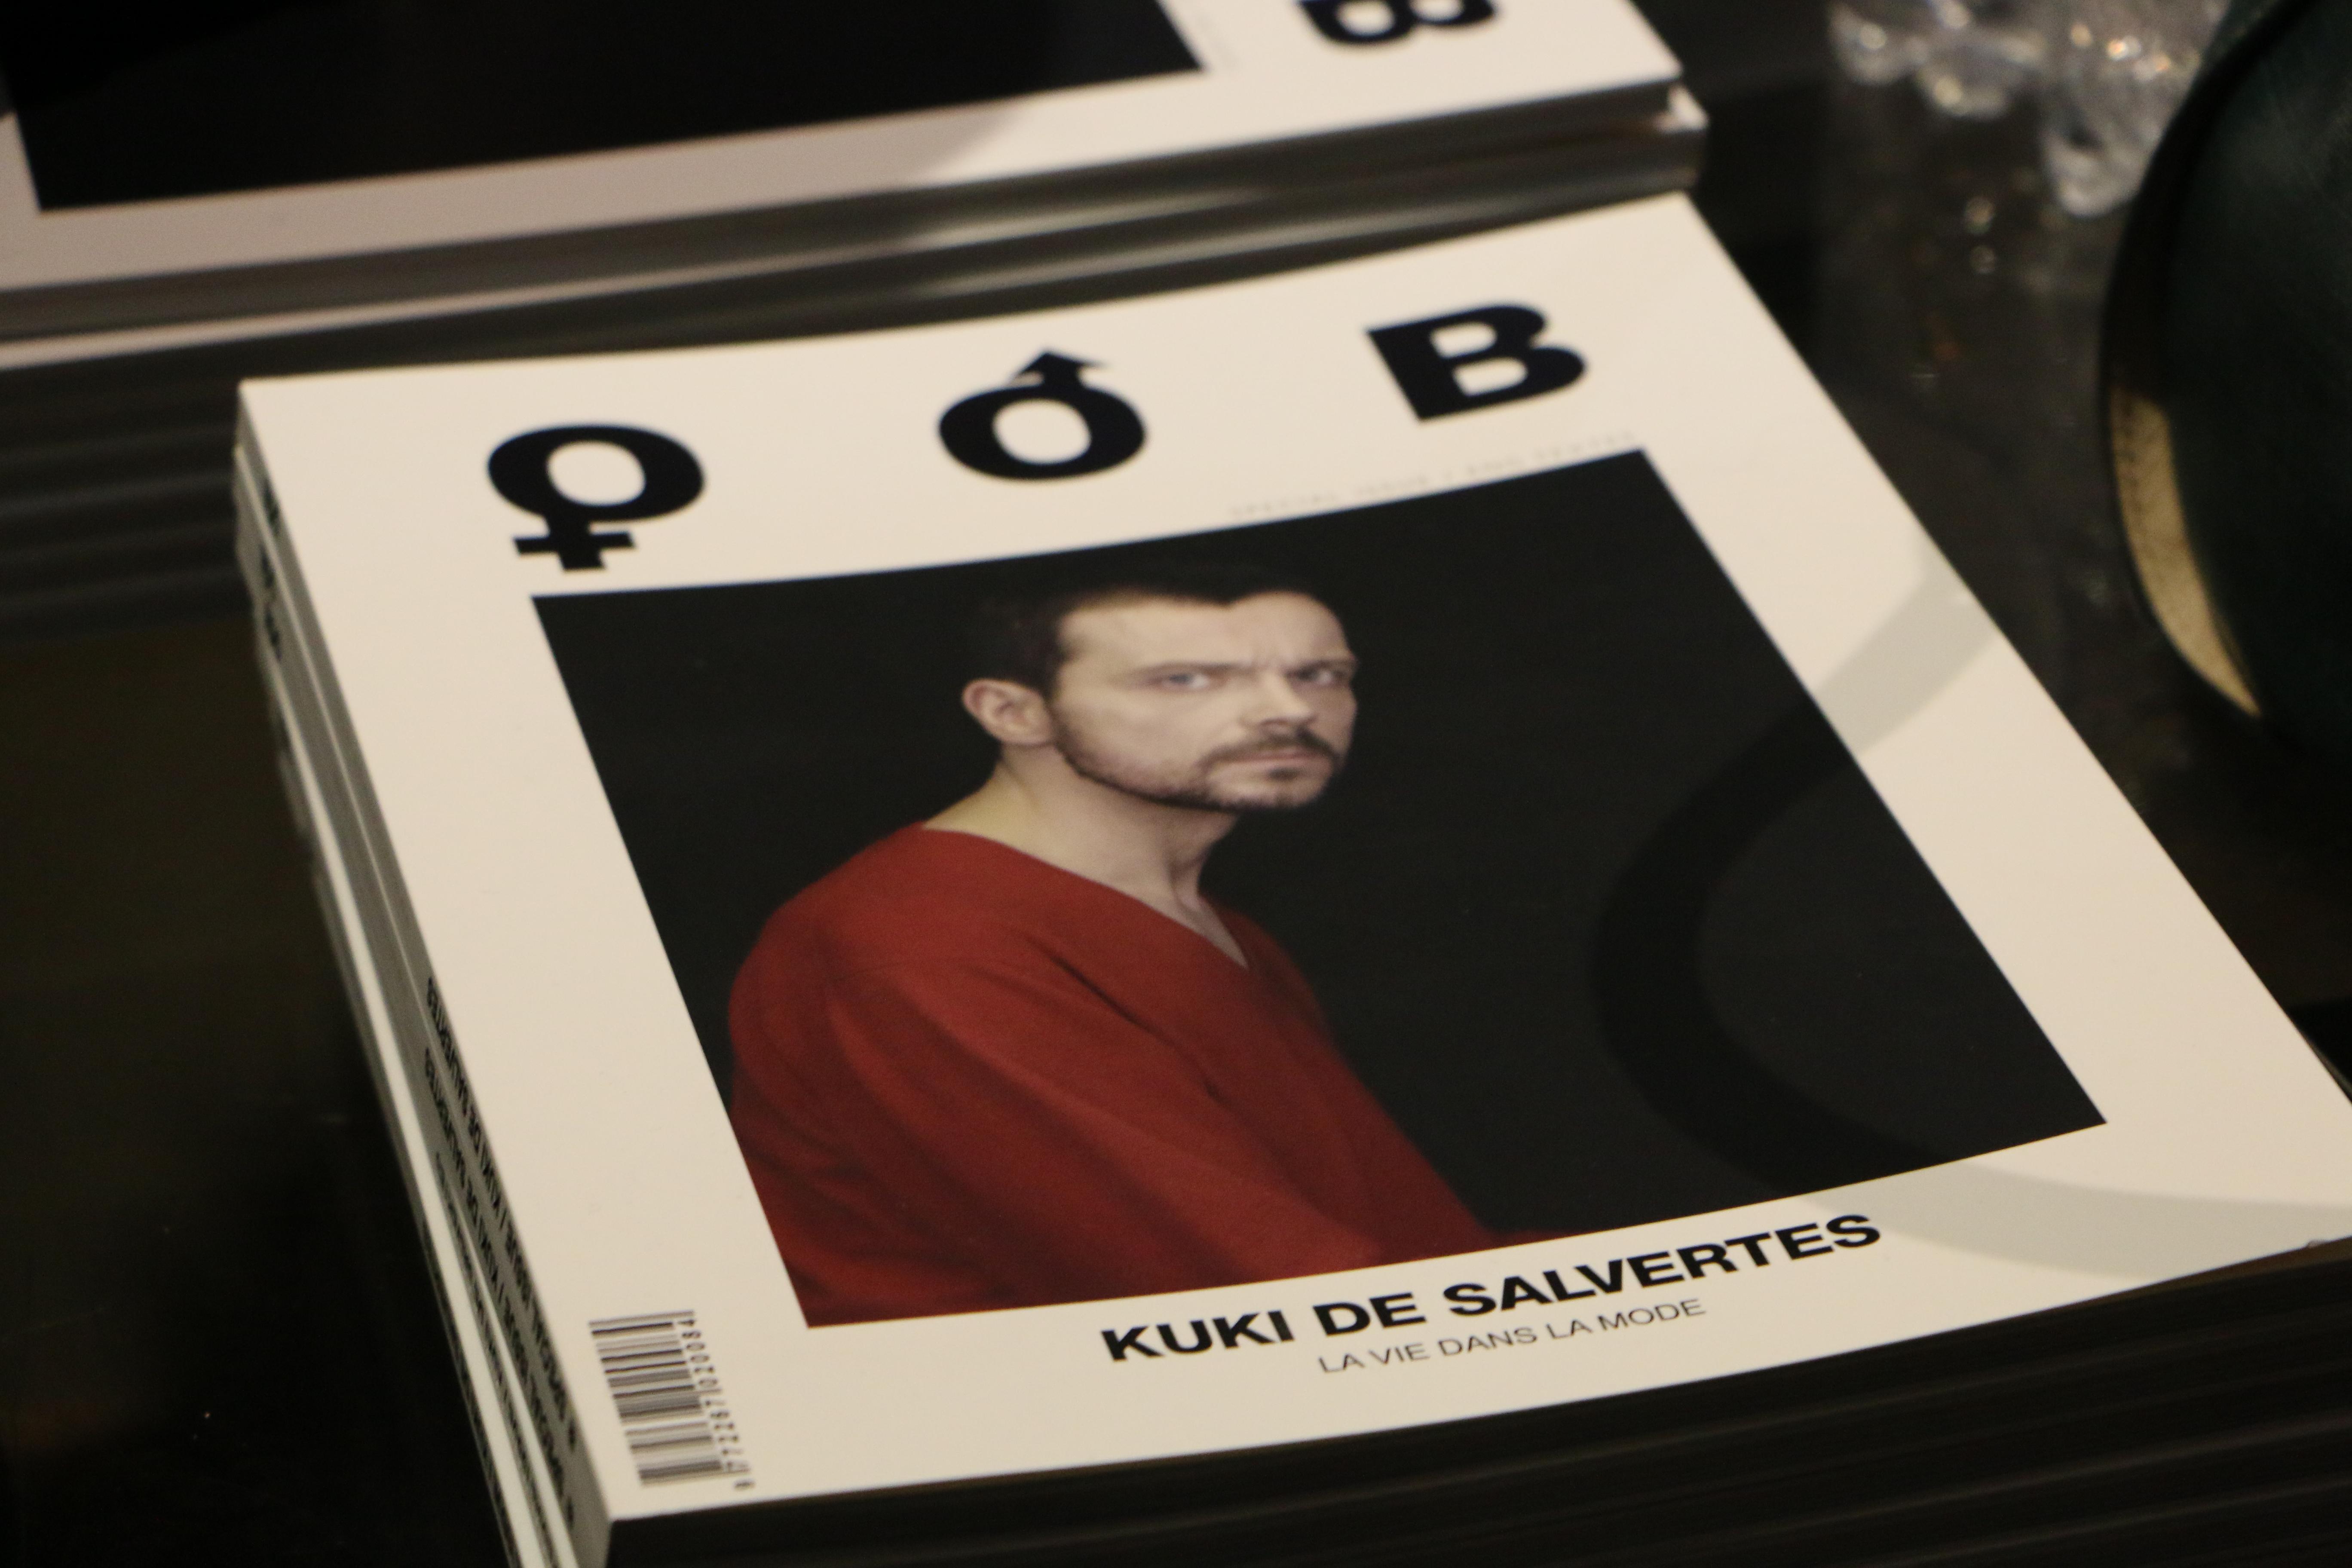 Kuki de Salvertes cocktail exhibition in paris